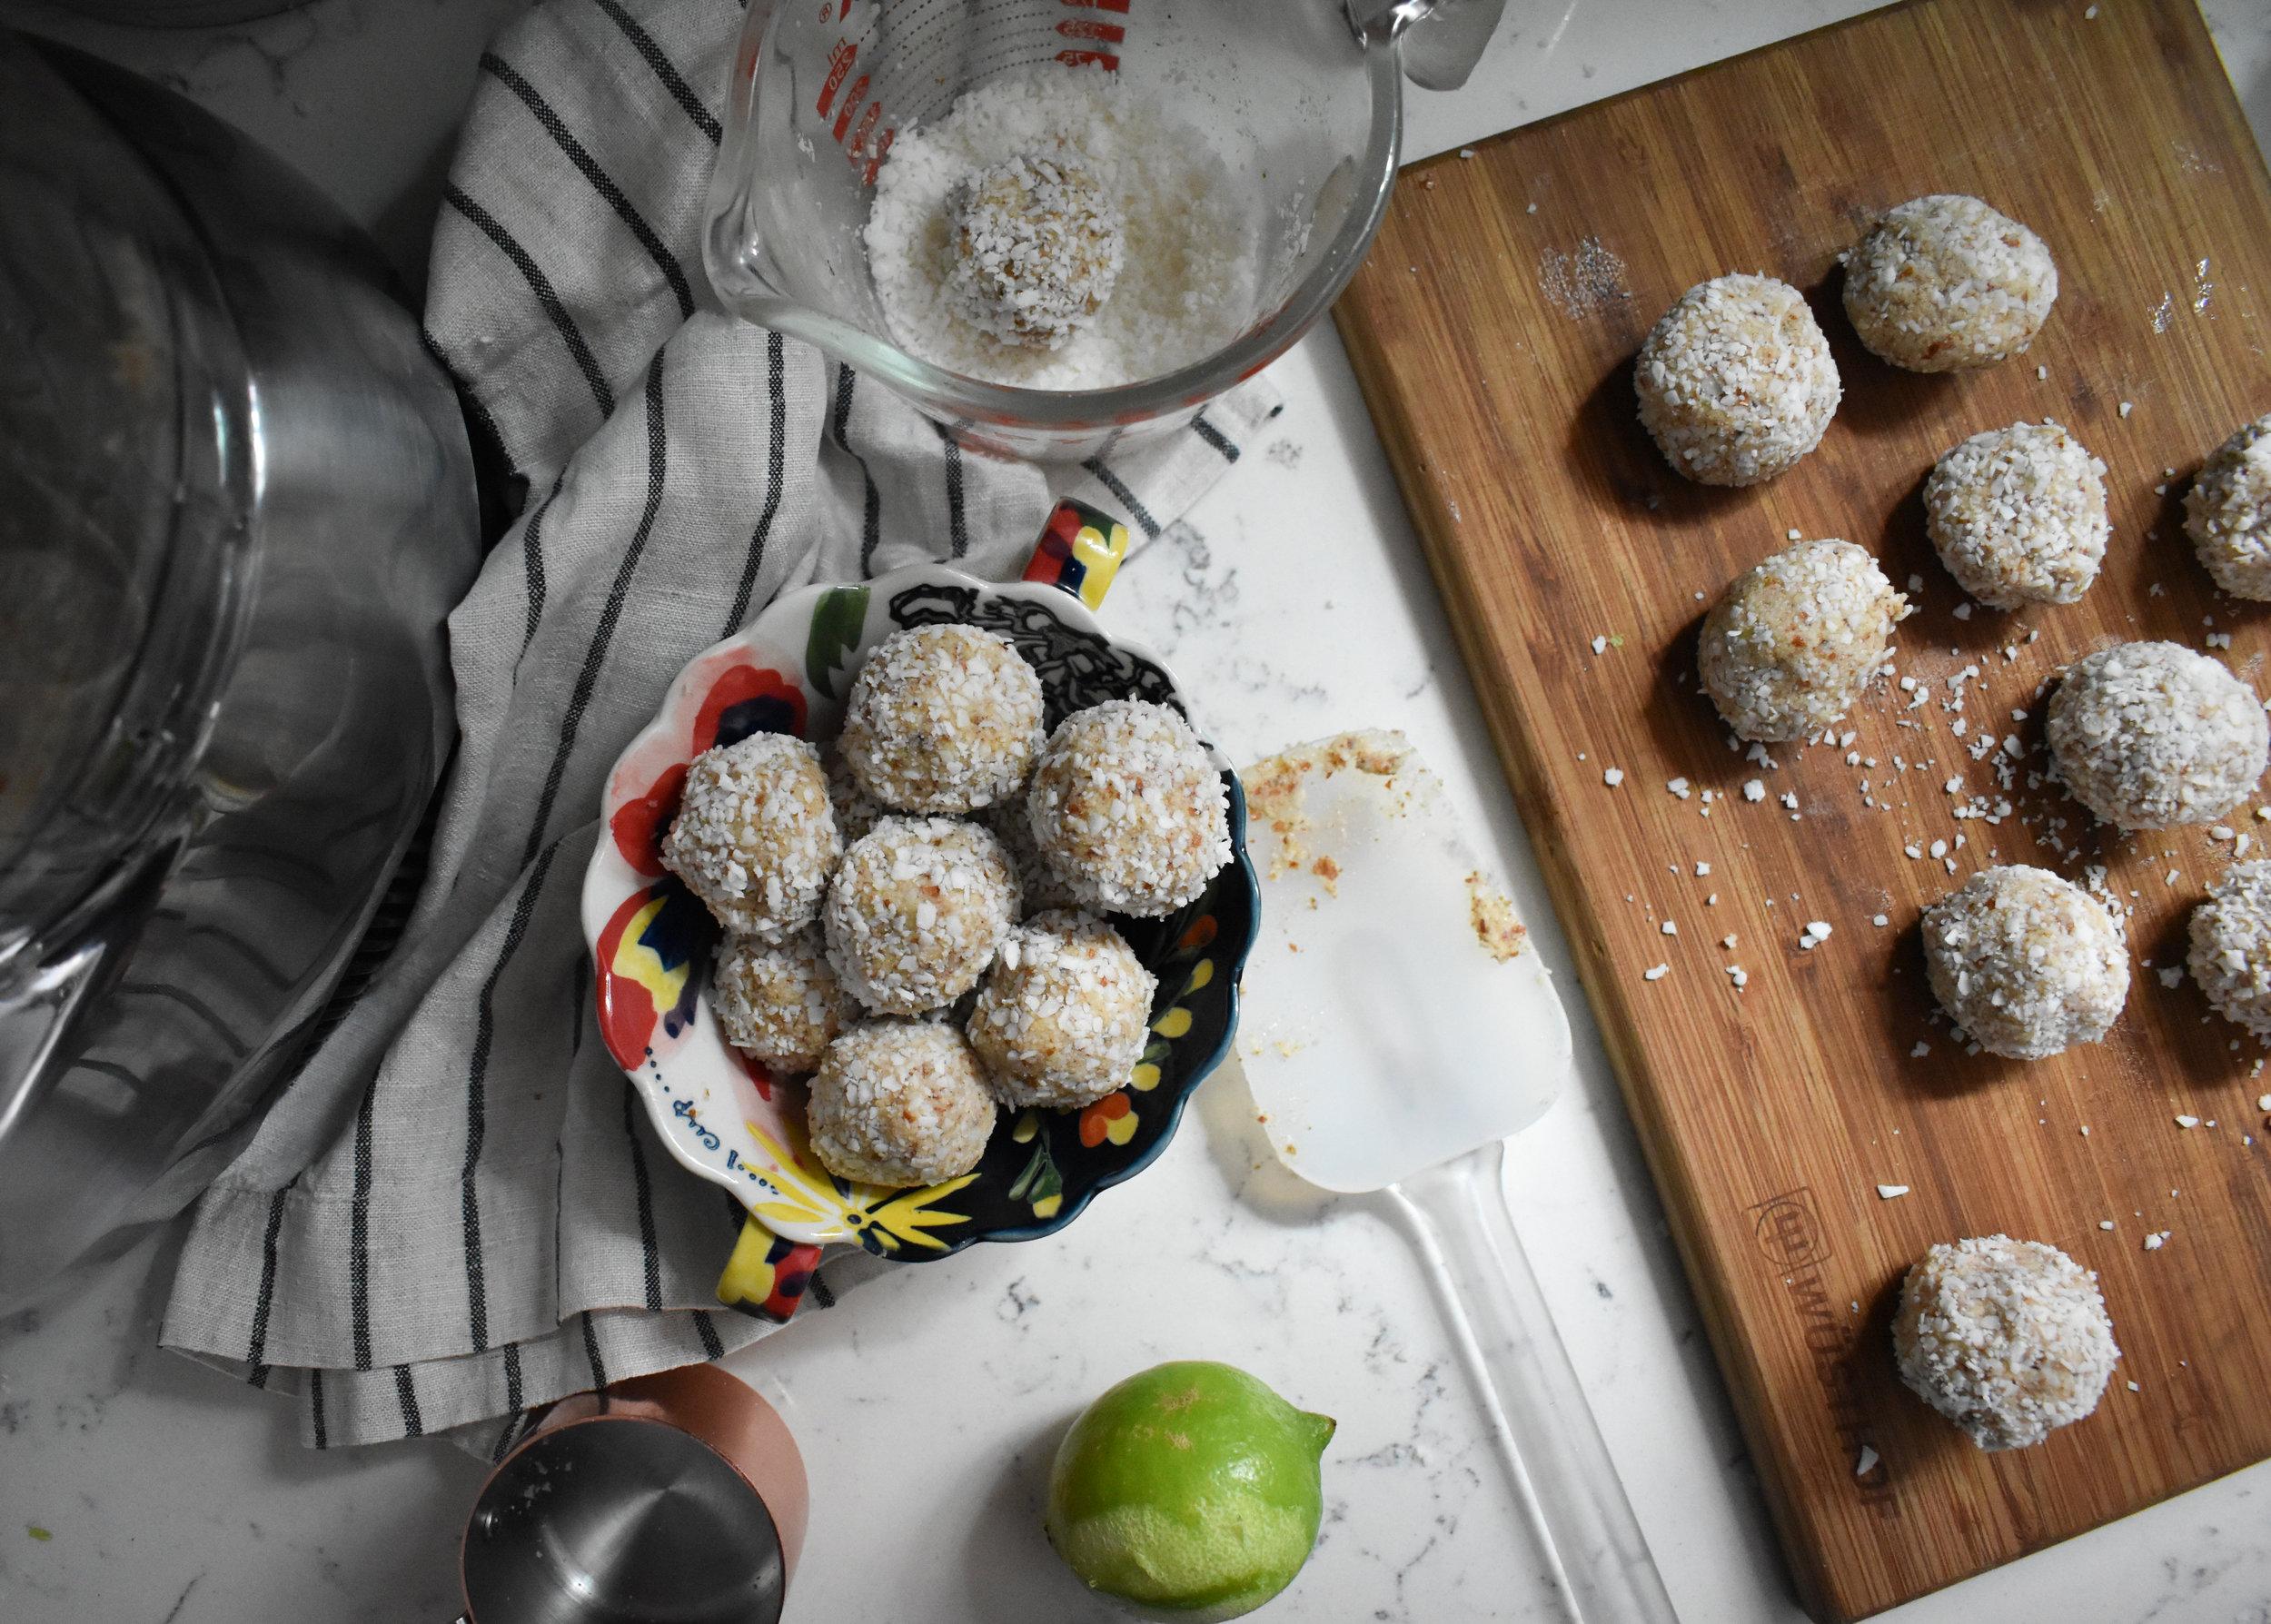 no almond pulp, coconut and cardamom bake energy bites